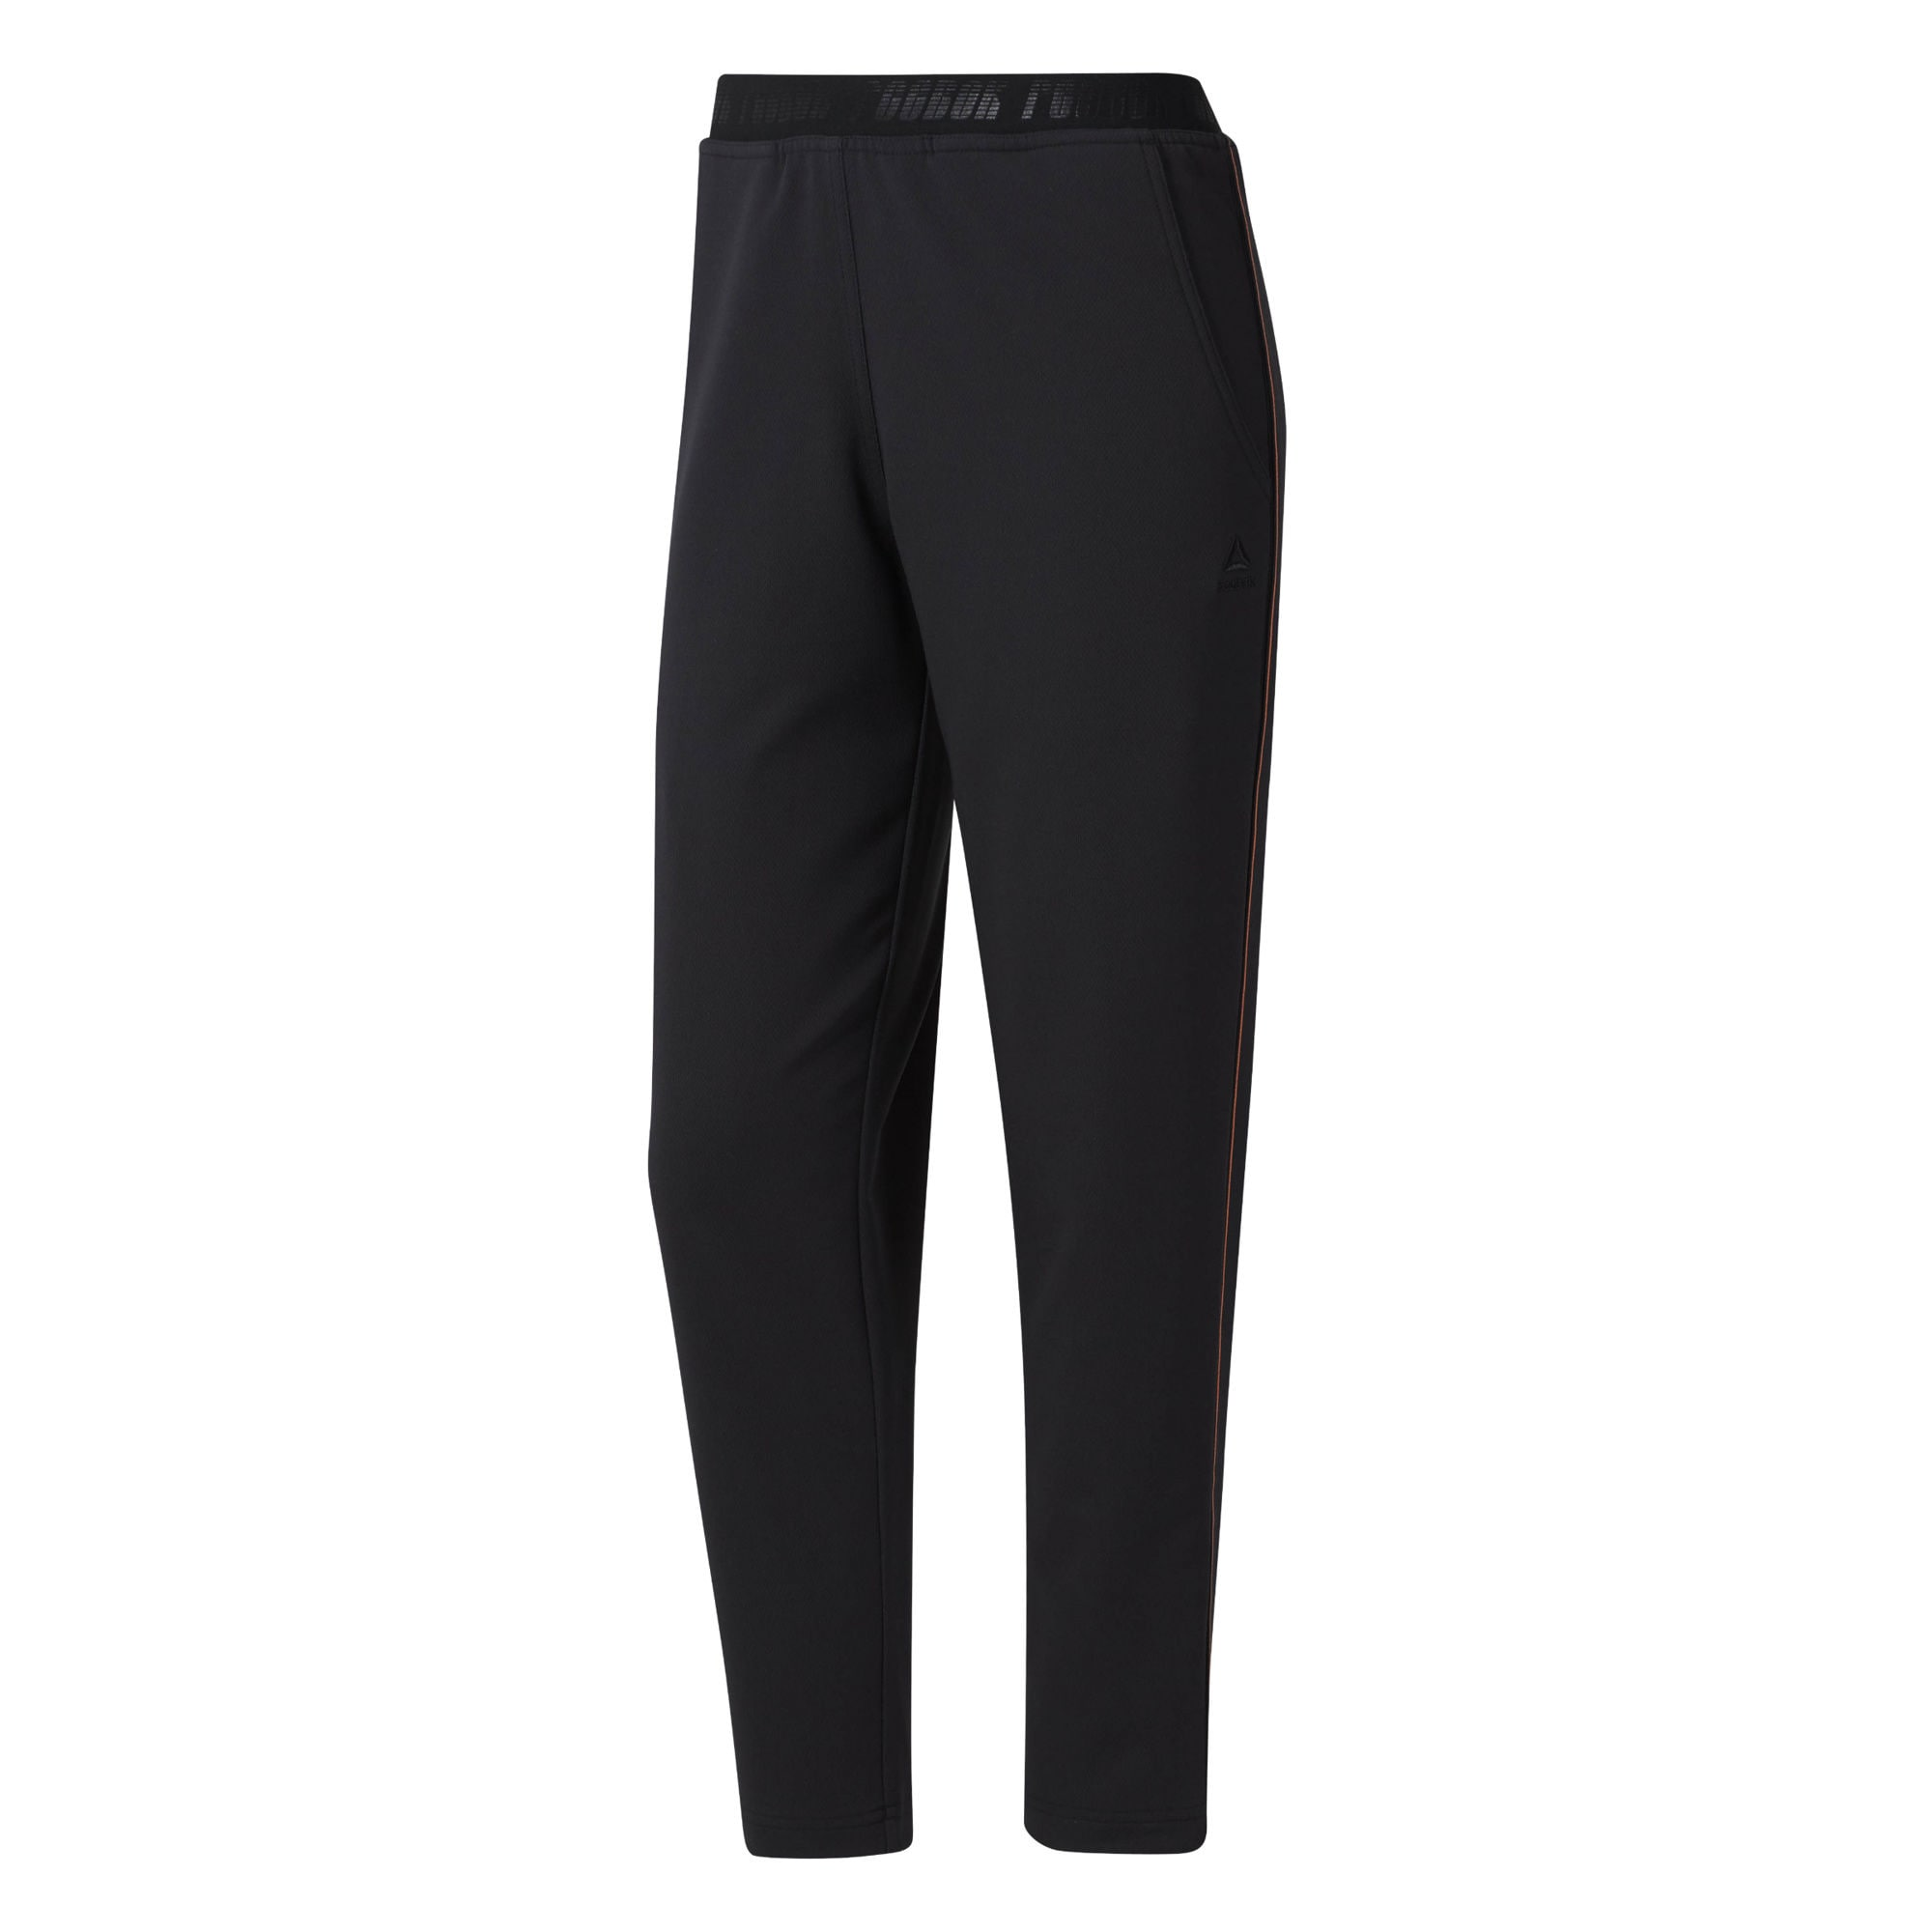 Hose 'Studio Fitness Lifestyle' | Sportbekleidung > Sporthosen > Sonstige Sporthosen | Reebok